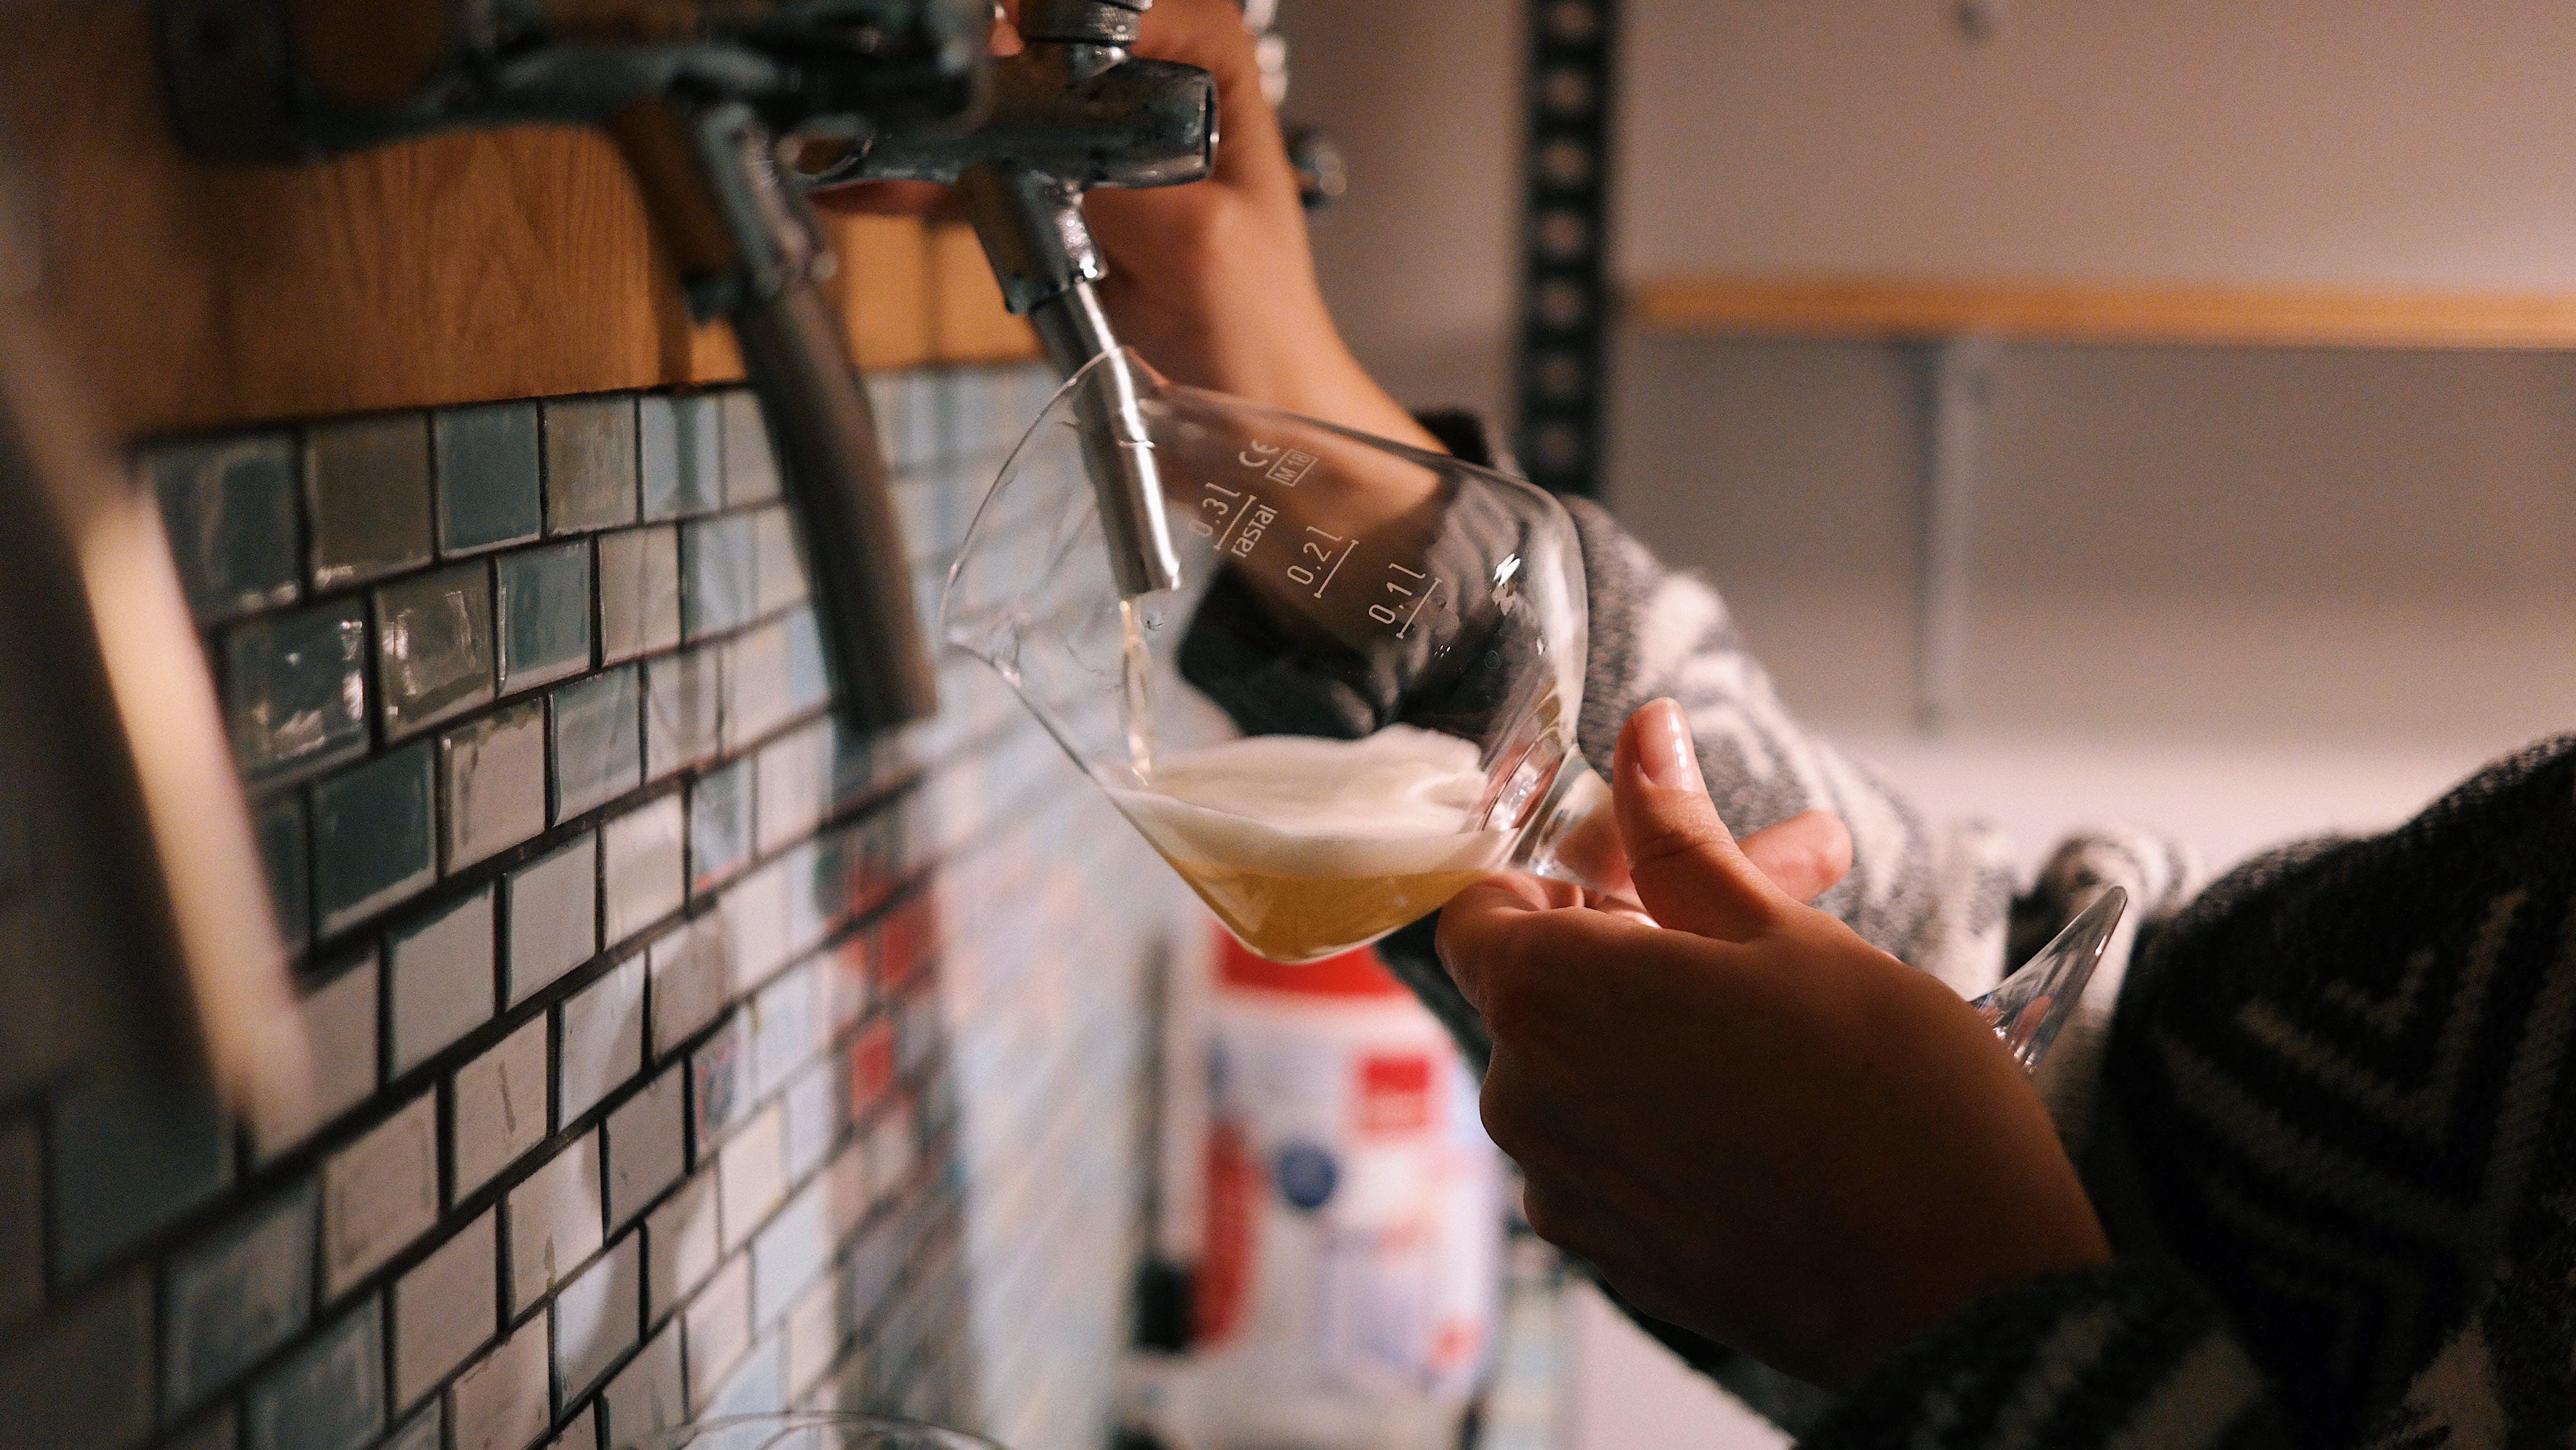 Person Holding Wine Glass Refilling Soda